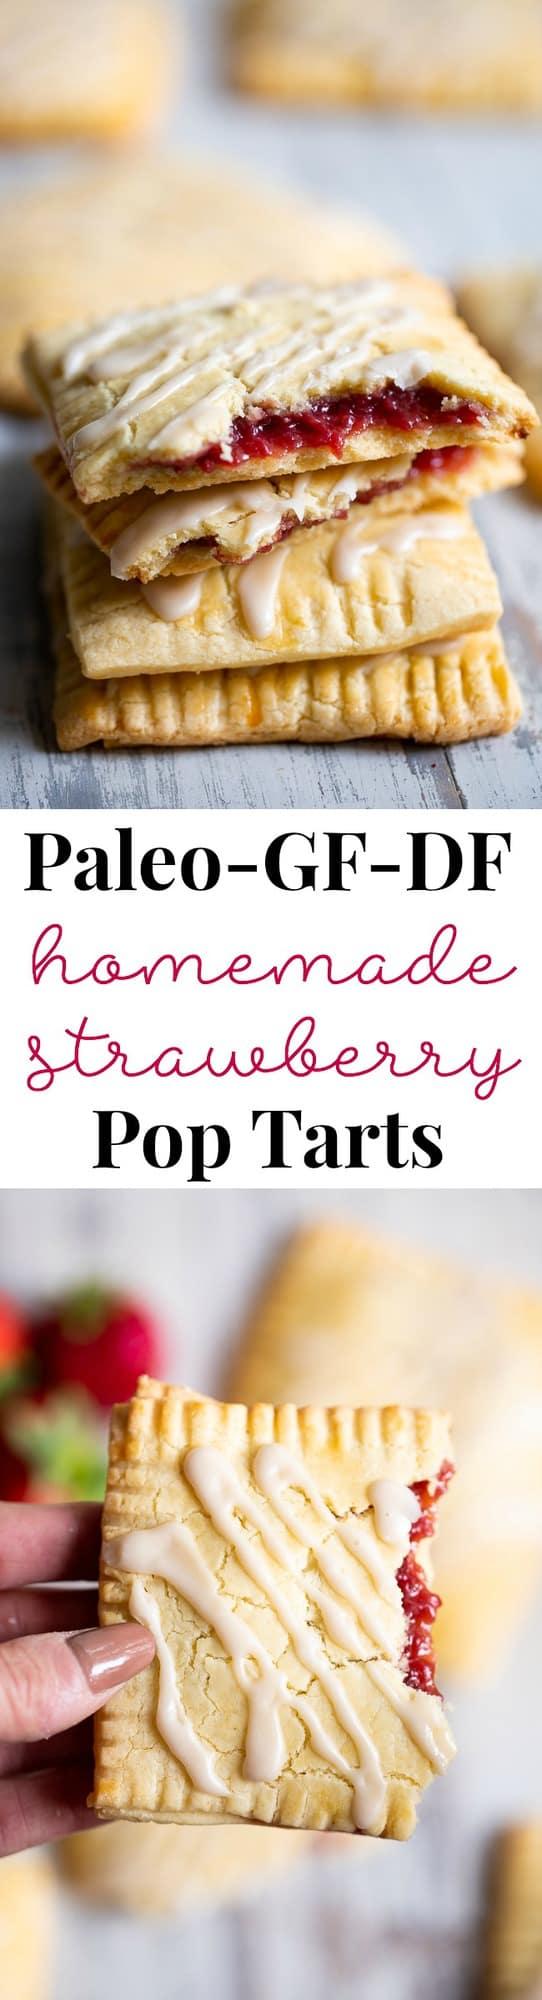 Paleo Strawberry Homemade Pop Tarts